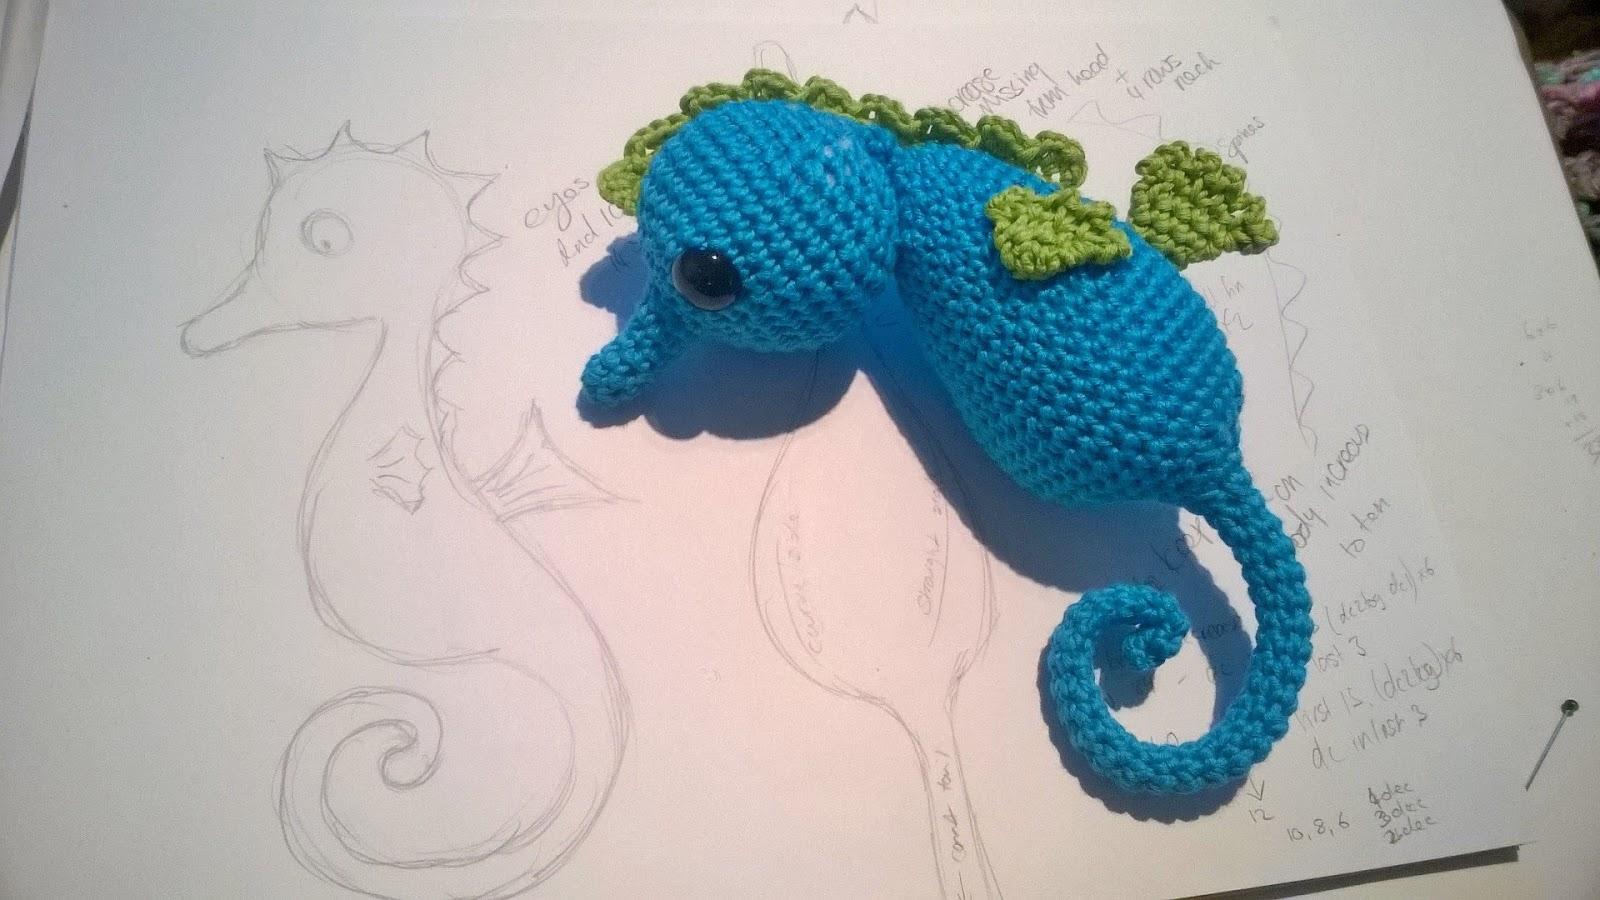 Seahorse Crochet Pattern | Kostenlose häkelmuster, Häkelanleitung ... | 900x1600